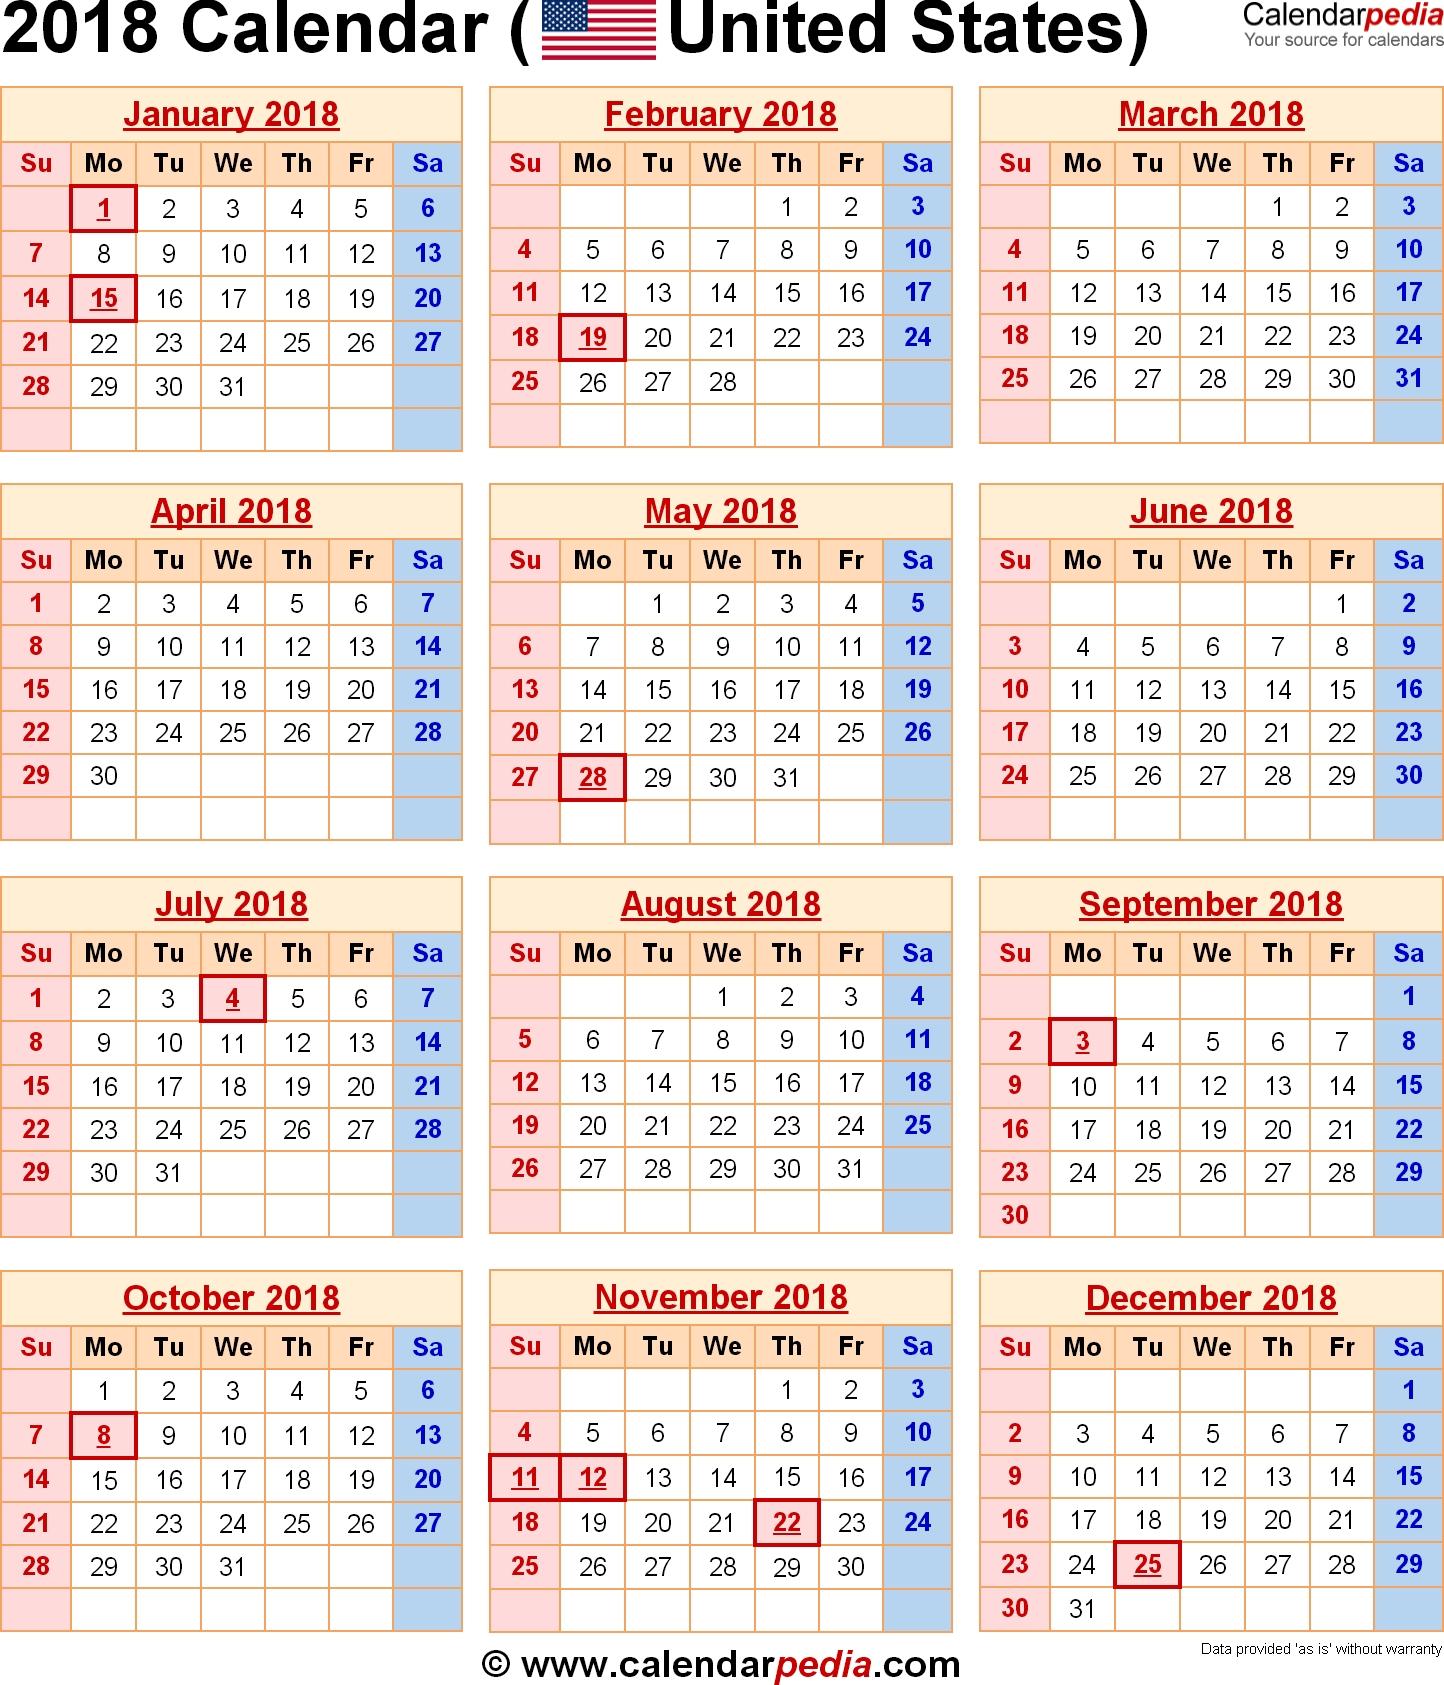 2018 Calendar Calendars Diy Pinterest Federal Holiday Free